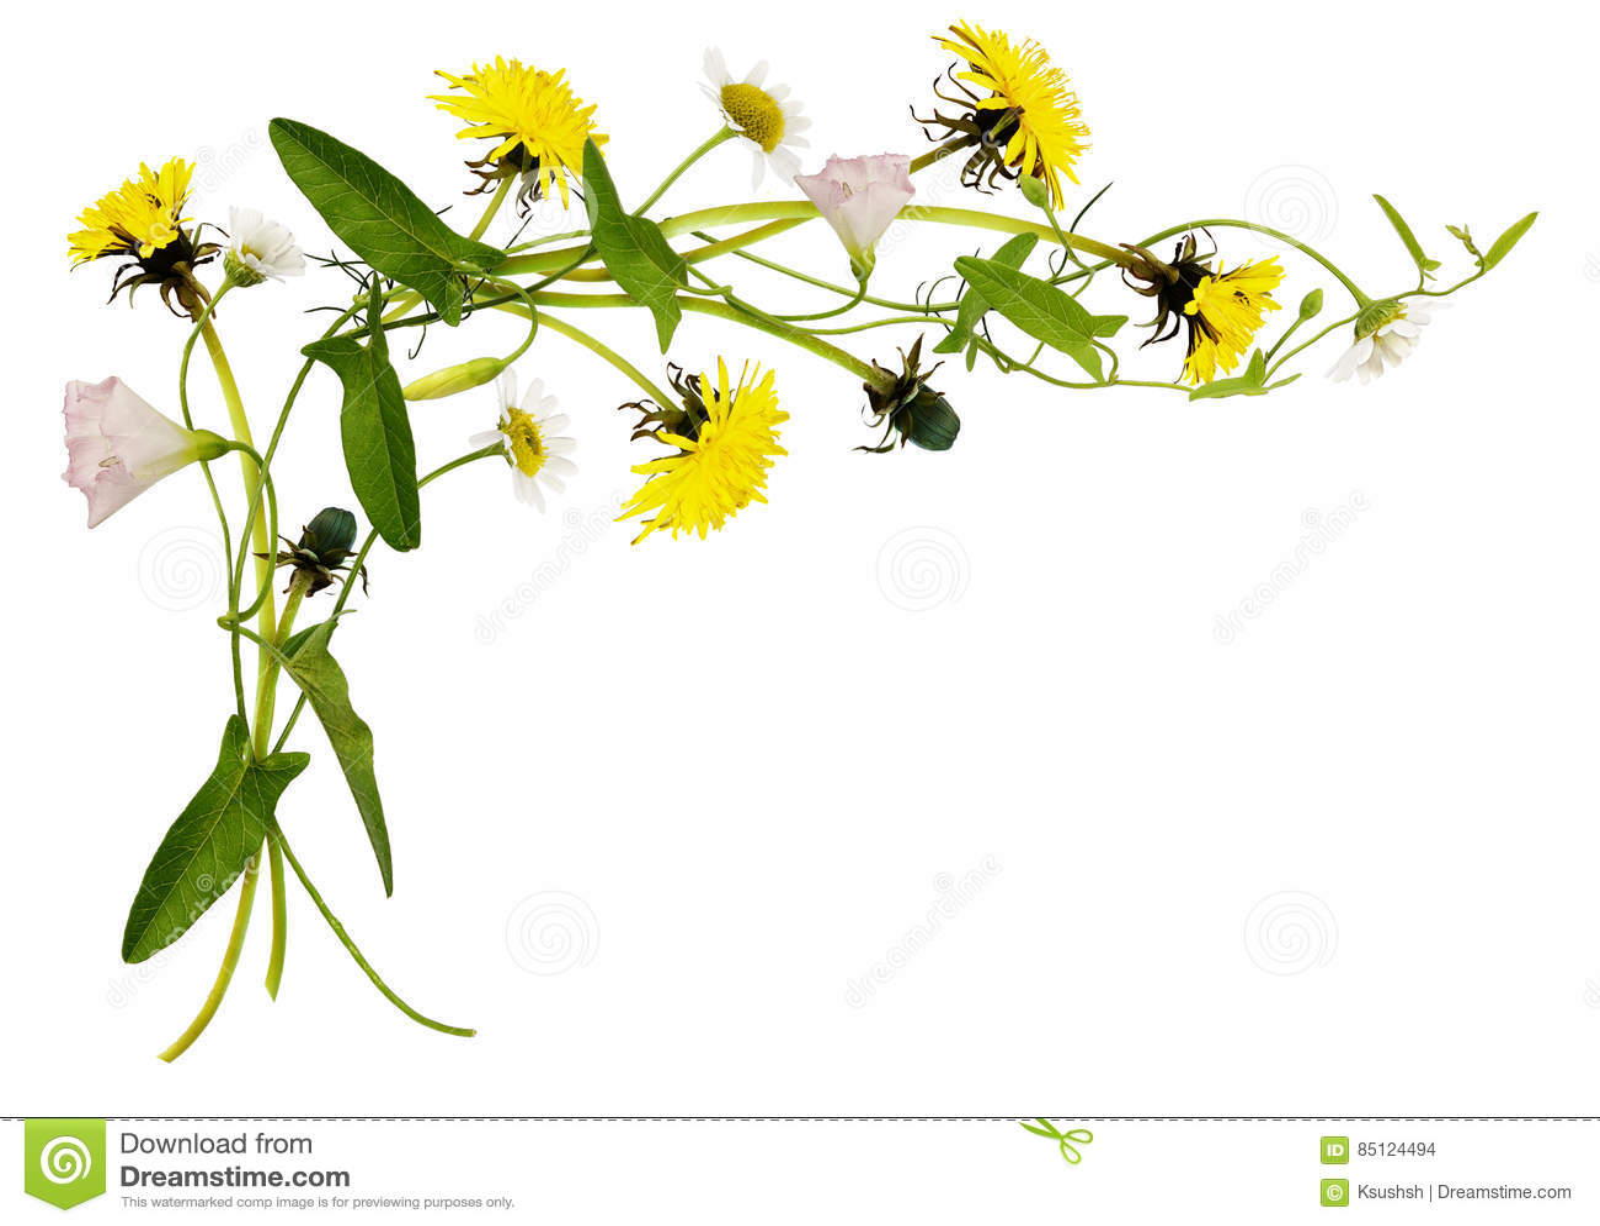 Bindweed Dandelion And Daisy Flowers And Leaves In Corner Arran